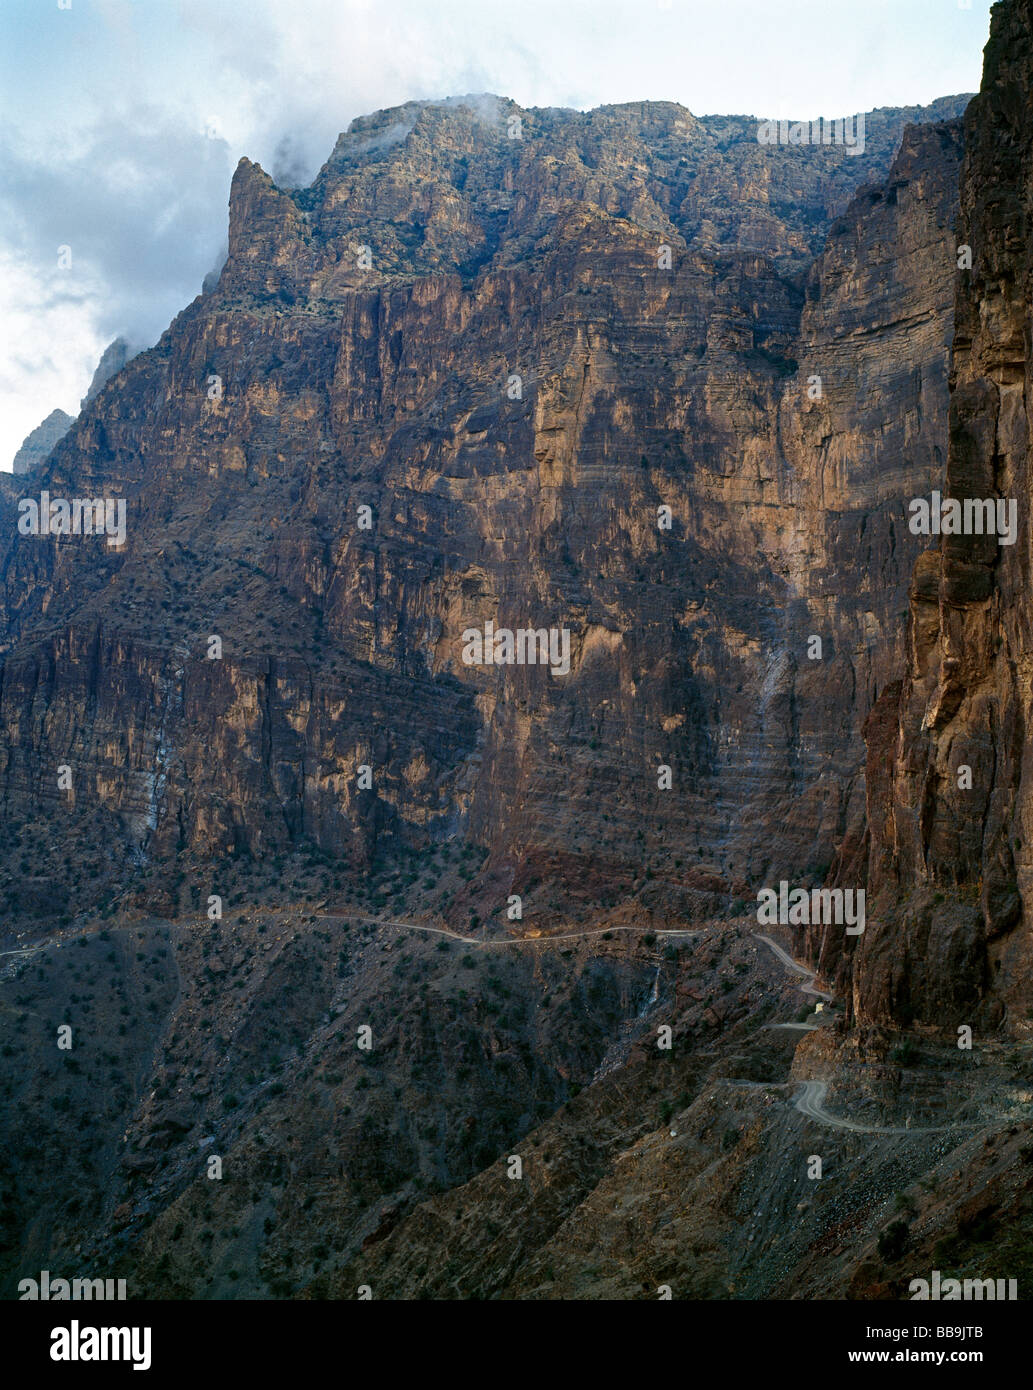 Breathtaking gravel road to Yasab Yasib Al Hajar al Gharb mountainsi on top of Jabal Shams Stock Photo